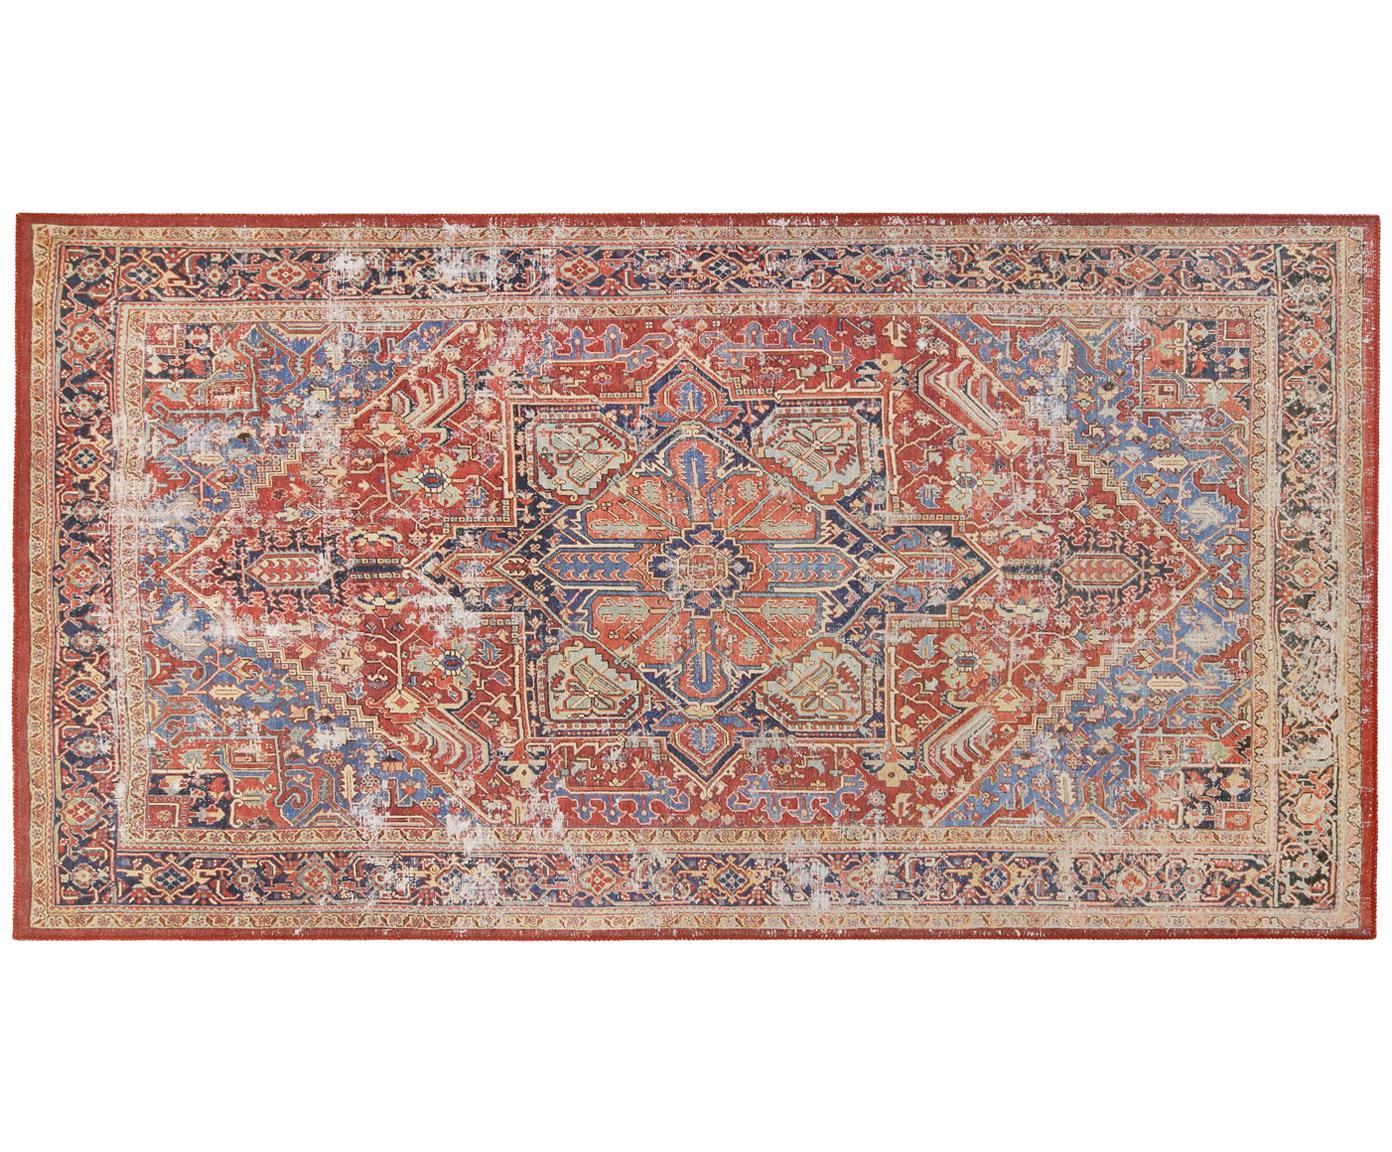 Chenille vloerkleed Paulo in vintage stijl, Bovenzijde: chenille draad (polyester, Rood, blauw, beige, 80 x 150 cm